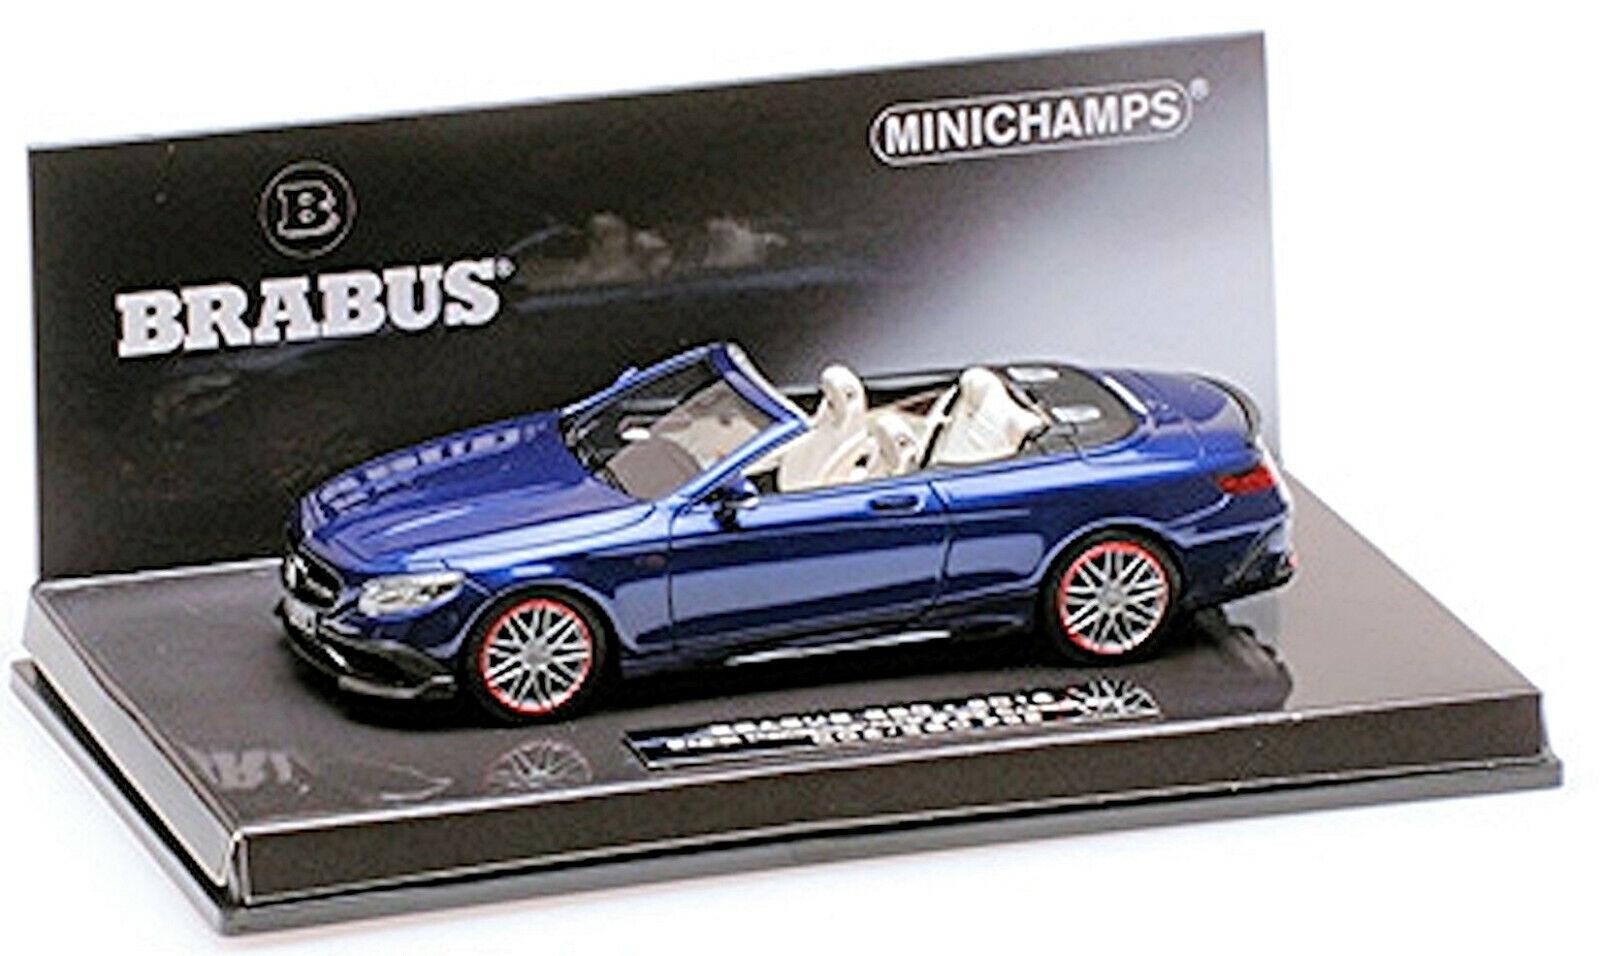 Brabus 850 Mercedes AMG S 63 2016 L. E. .280 Pcs bluee Metal 1 43 Minichamps